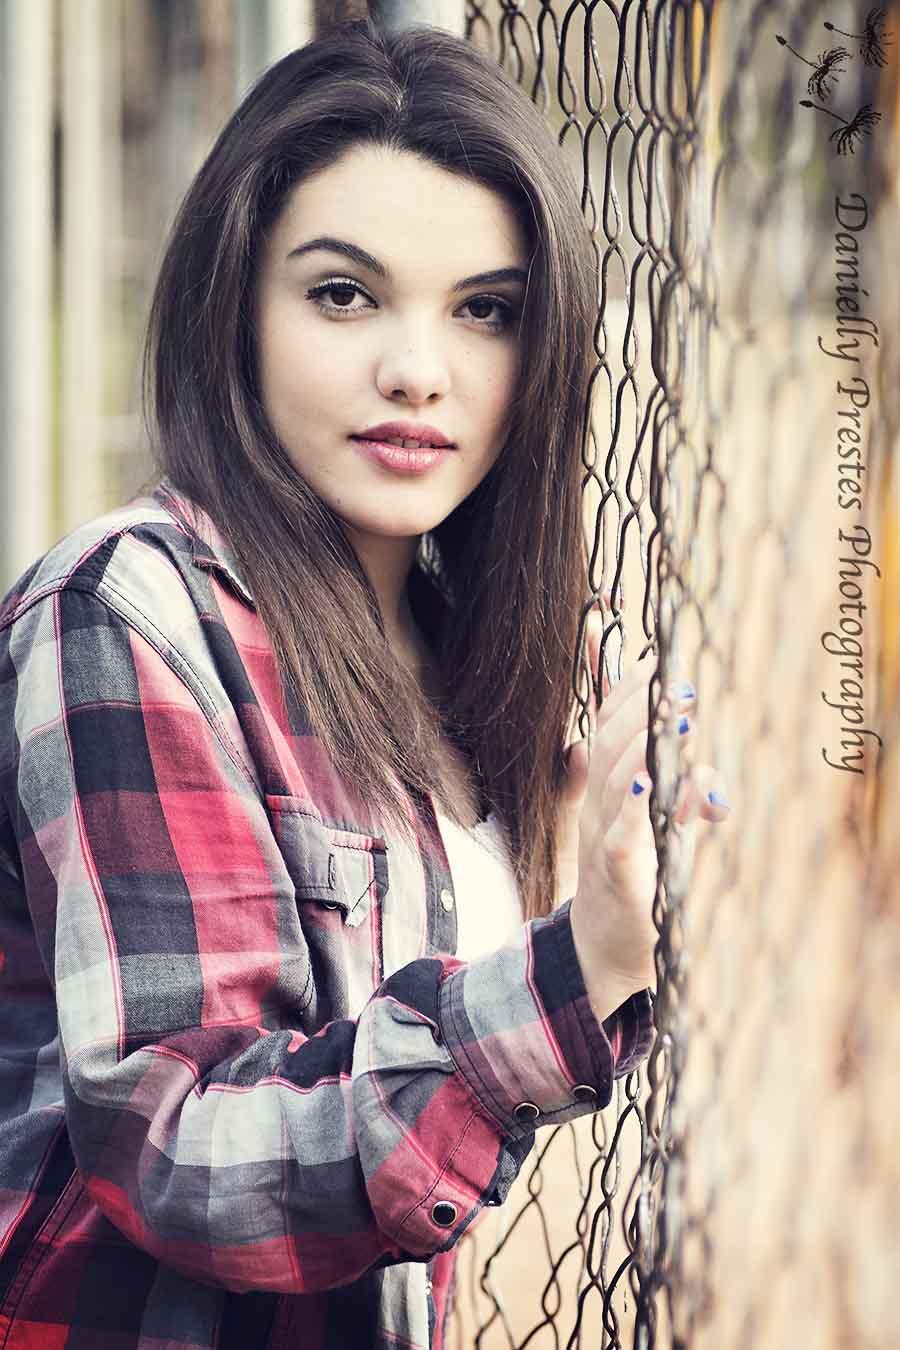 Bruna_29low